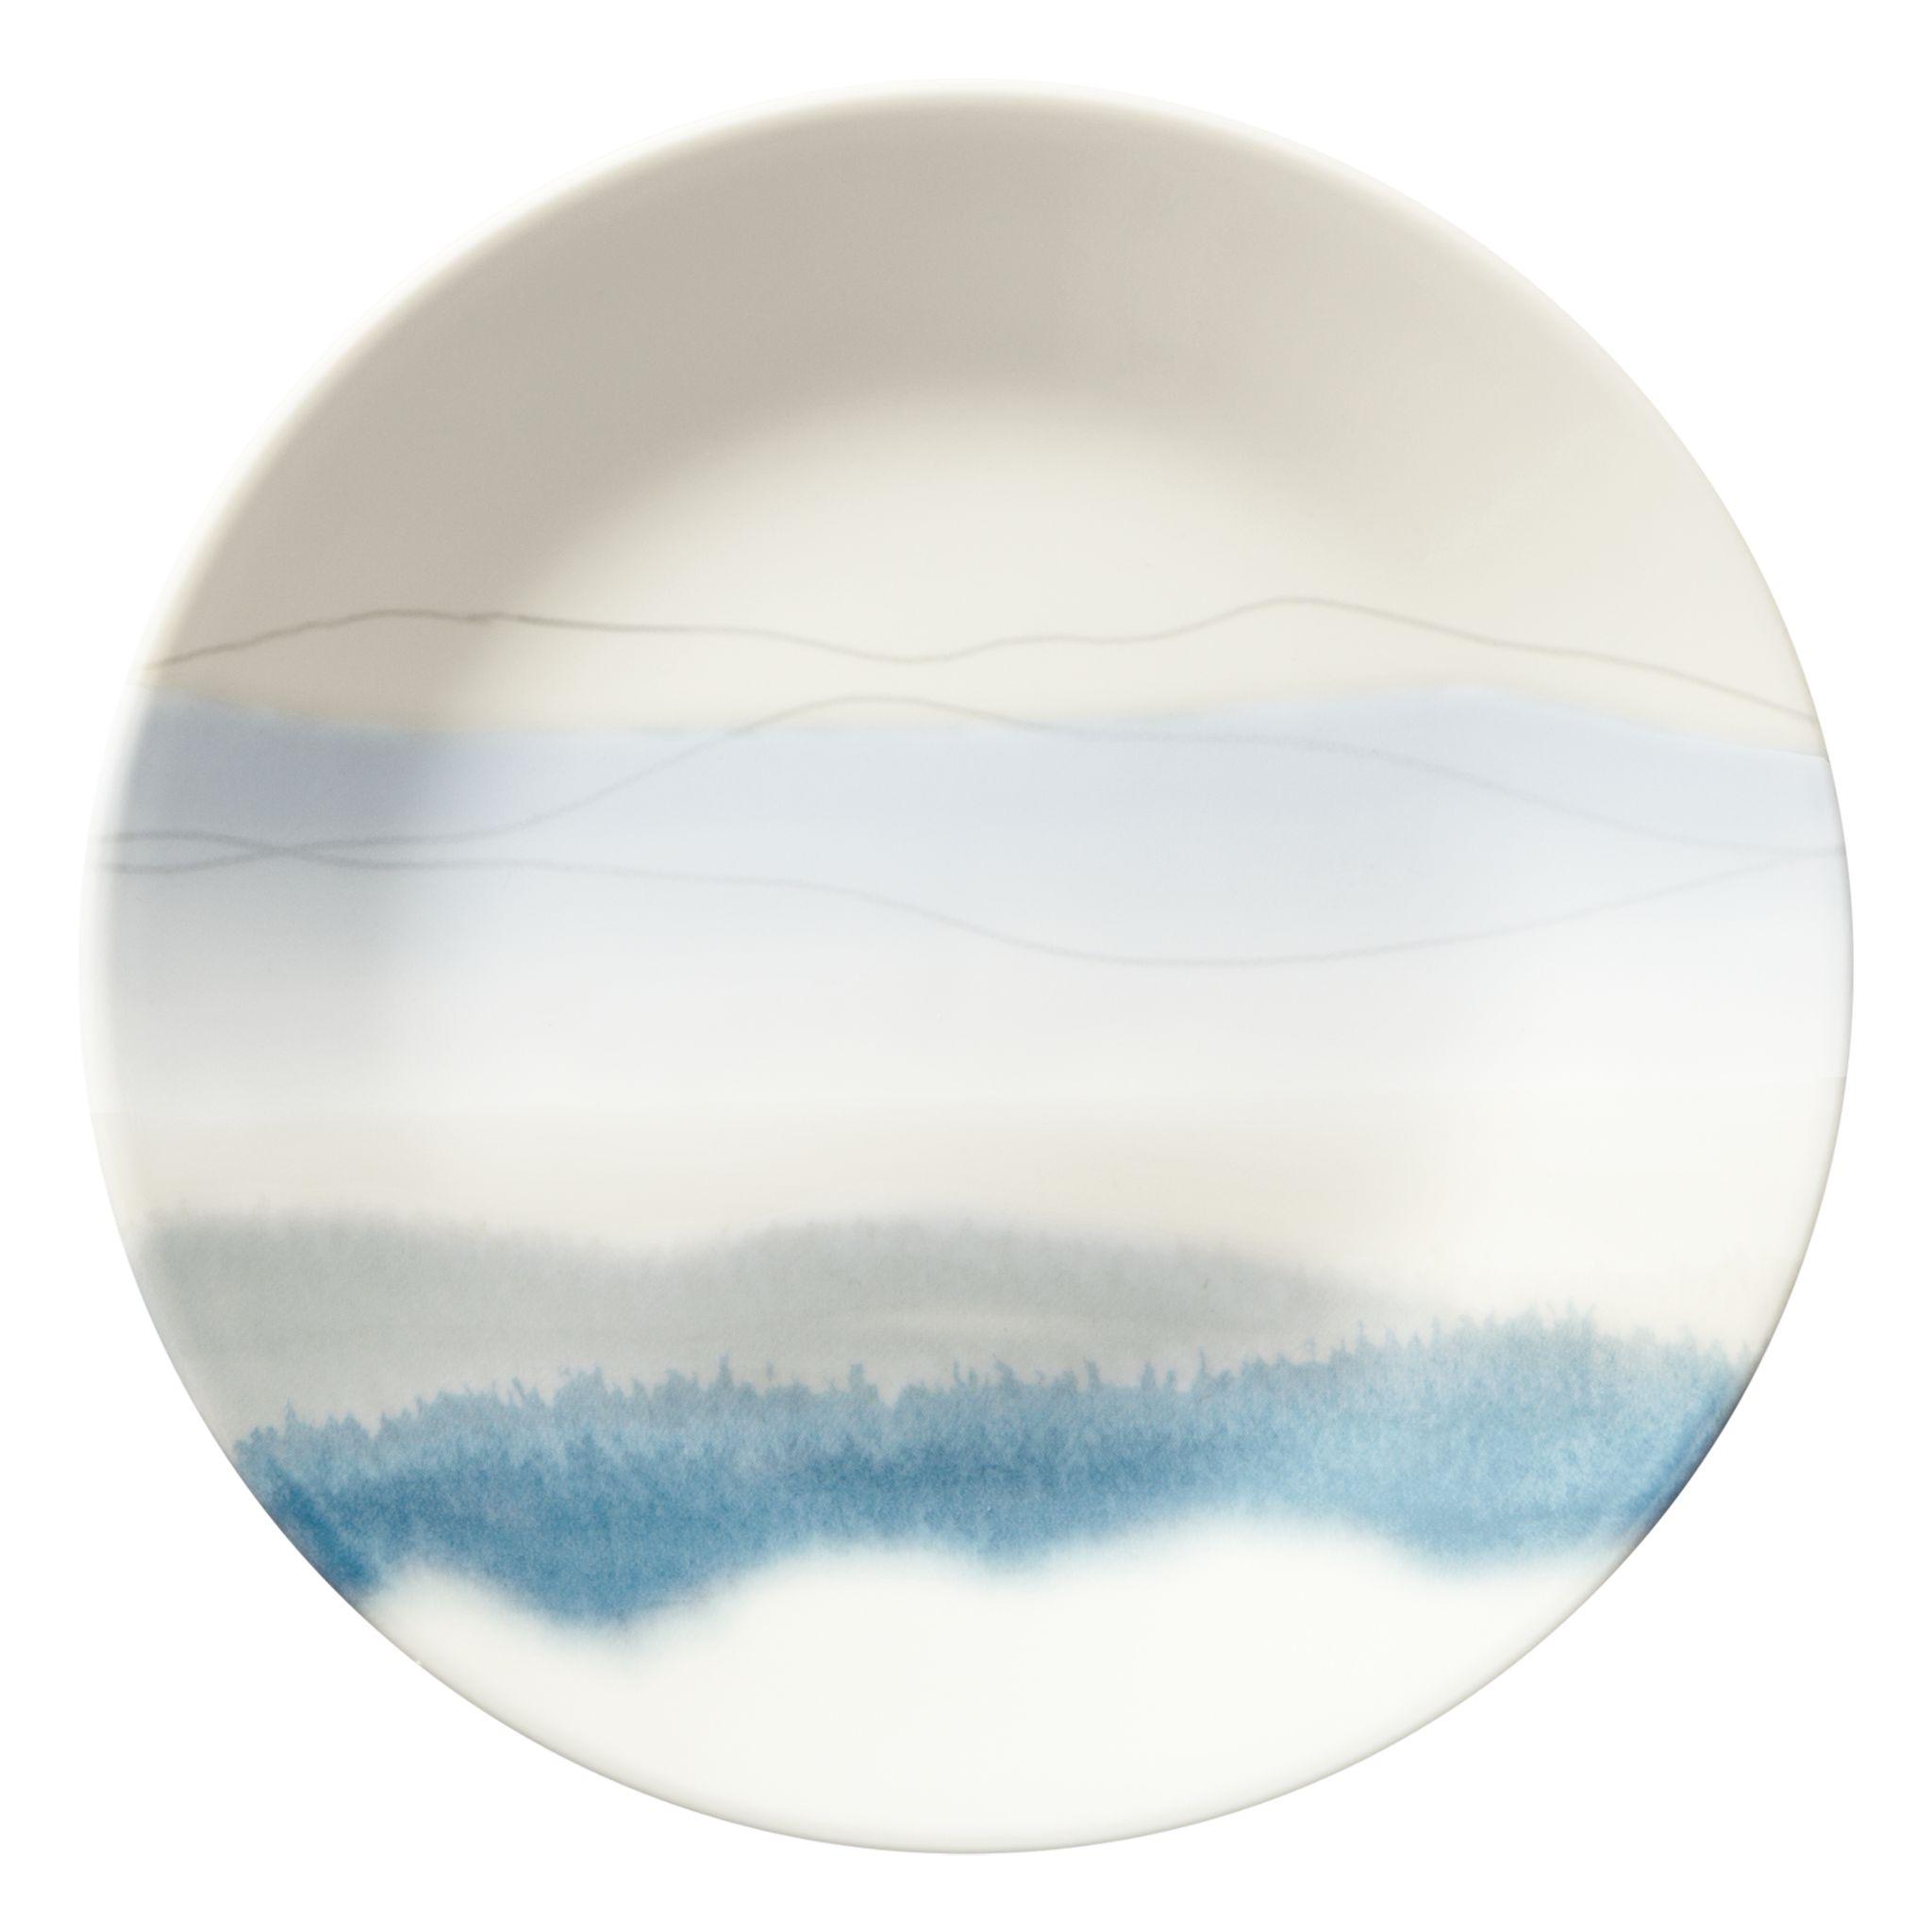 Corelle_Blue_Adirondack_675_Appetizer_Plate